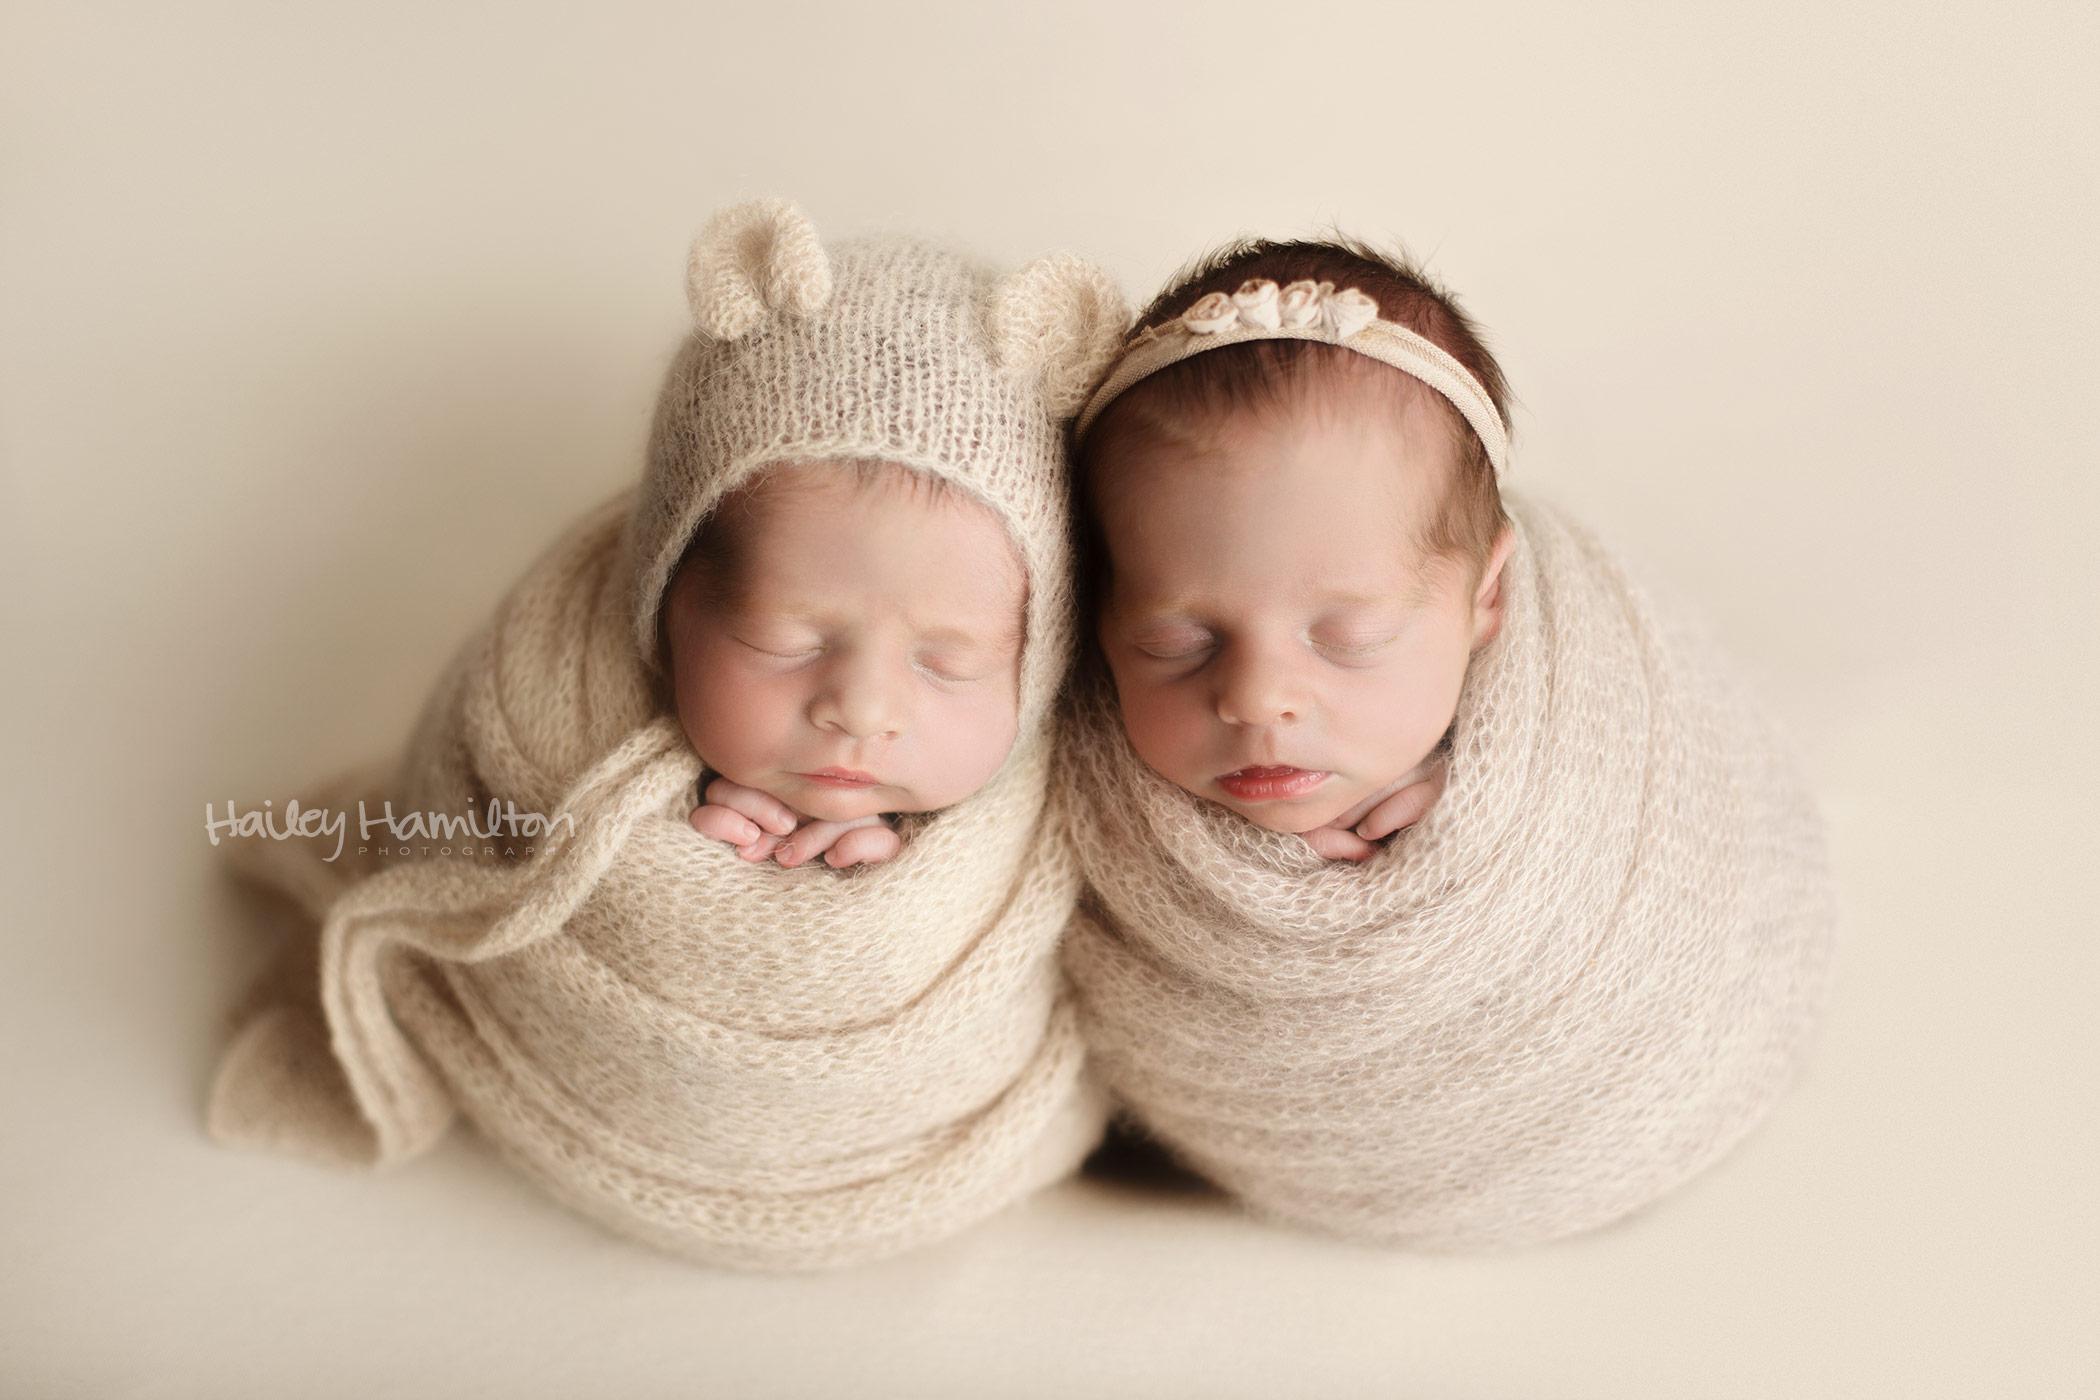 Twins-newborn-photographer-Calgary-new-born-photography-photo-studio